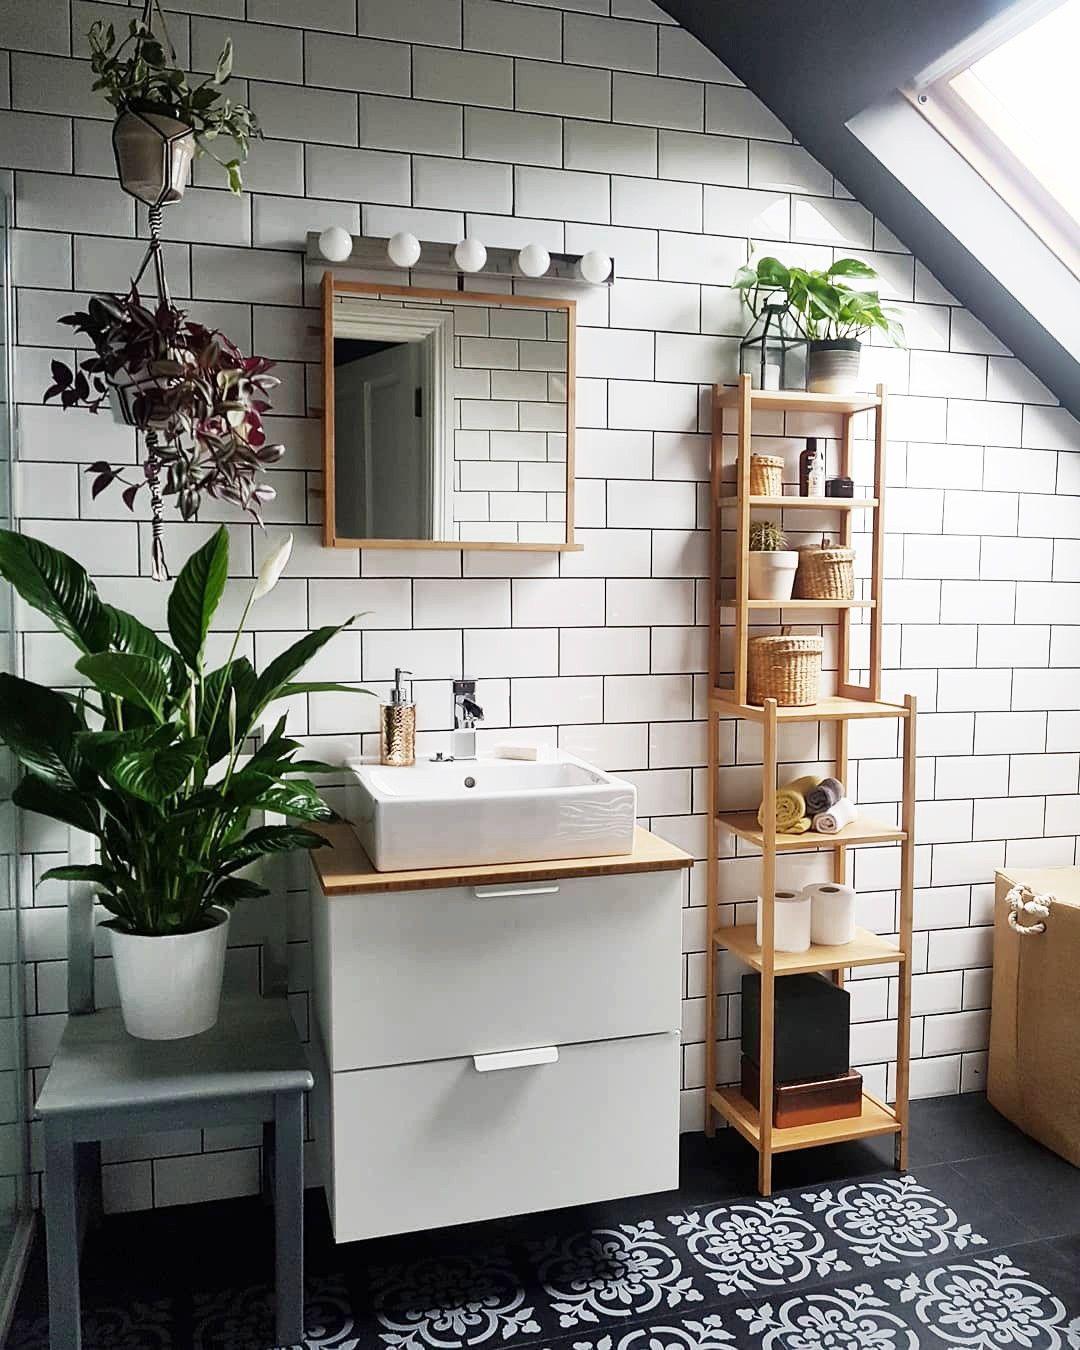 Black And White Bathroom Bathroom Interior Design Home Decor Interior